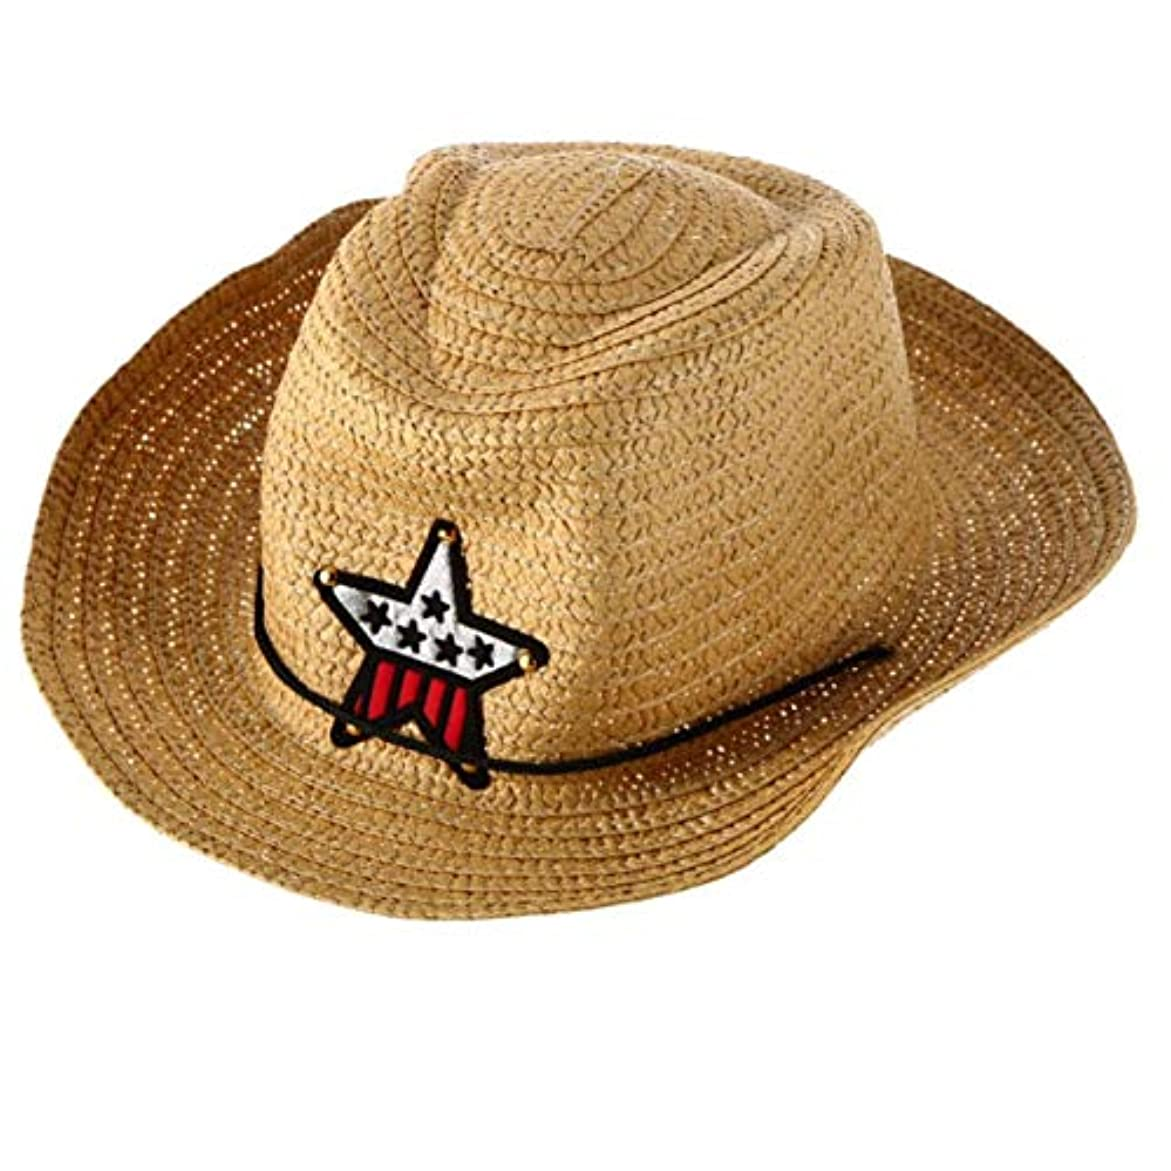 DeeploveUU スタイリッシュな子供子供西部のカウボーイわら日帽子防風キャップ夏ビッグワイドつばサンボネット付き星飾り